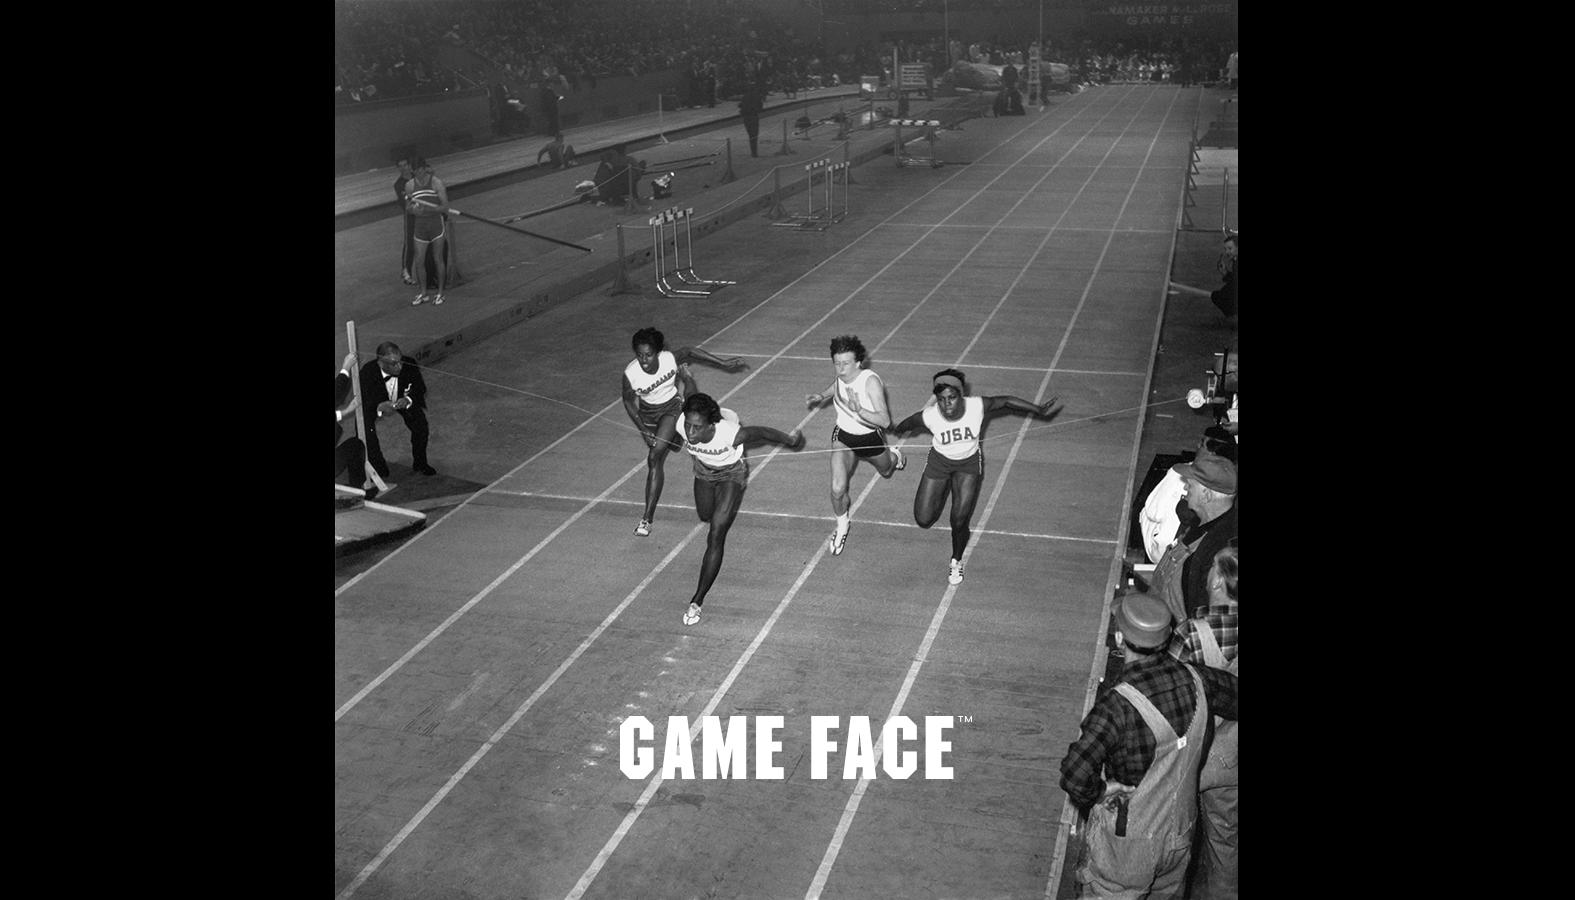 Tennessee Girl Wins 60-Yard Dash,  1965, photographer unknown, AP/Wide World Photos